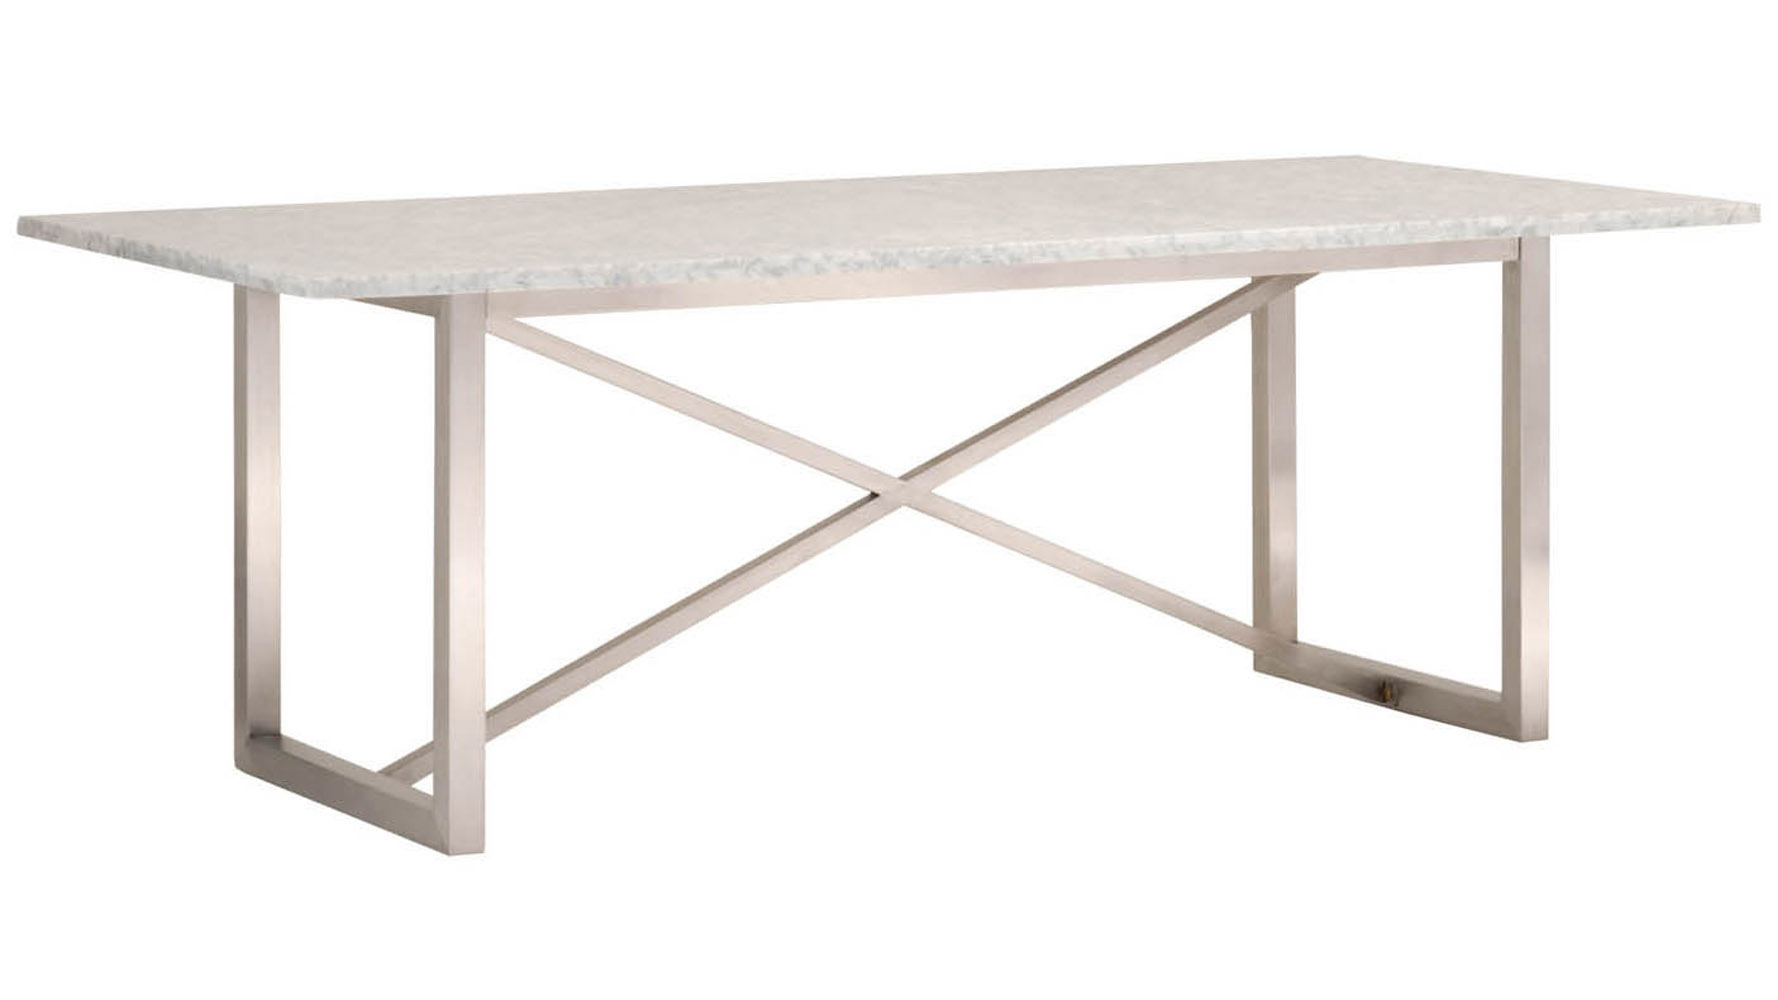 2006 2018 Zuri Furniture Llc All Rights Reserved